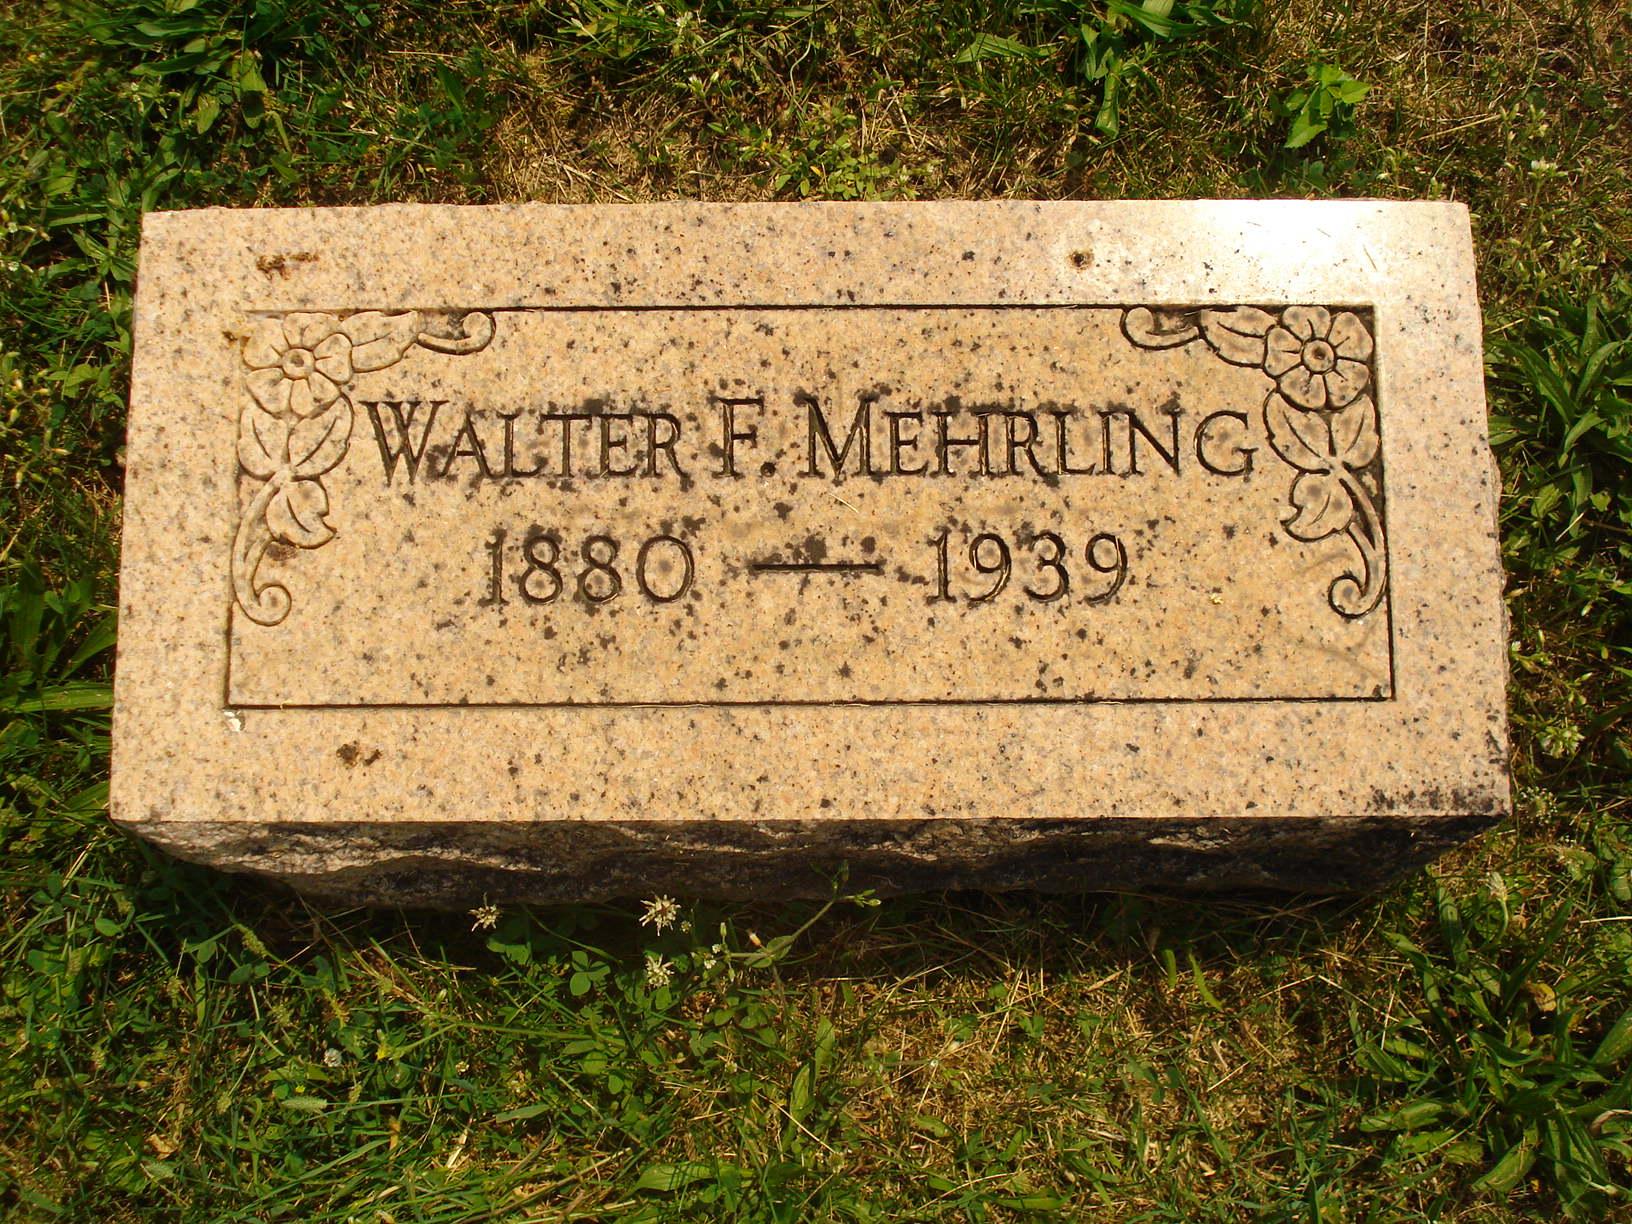 Walter F Mehrling gravestone